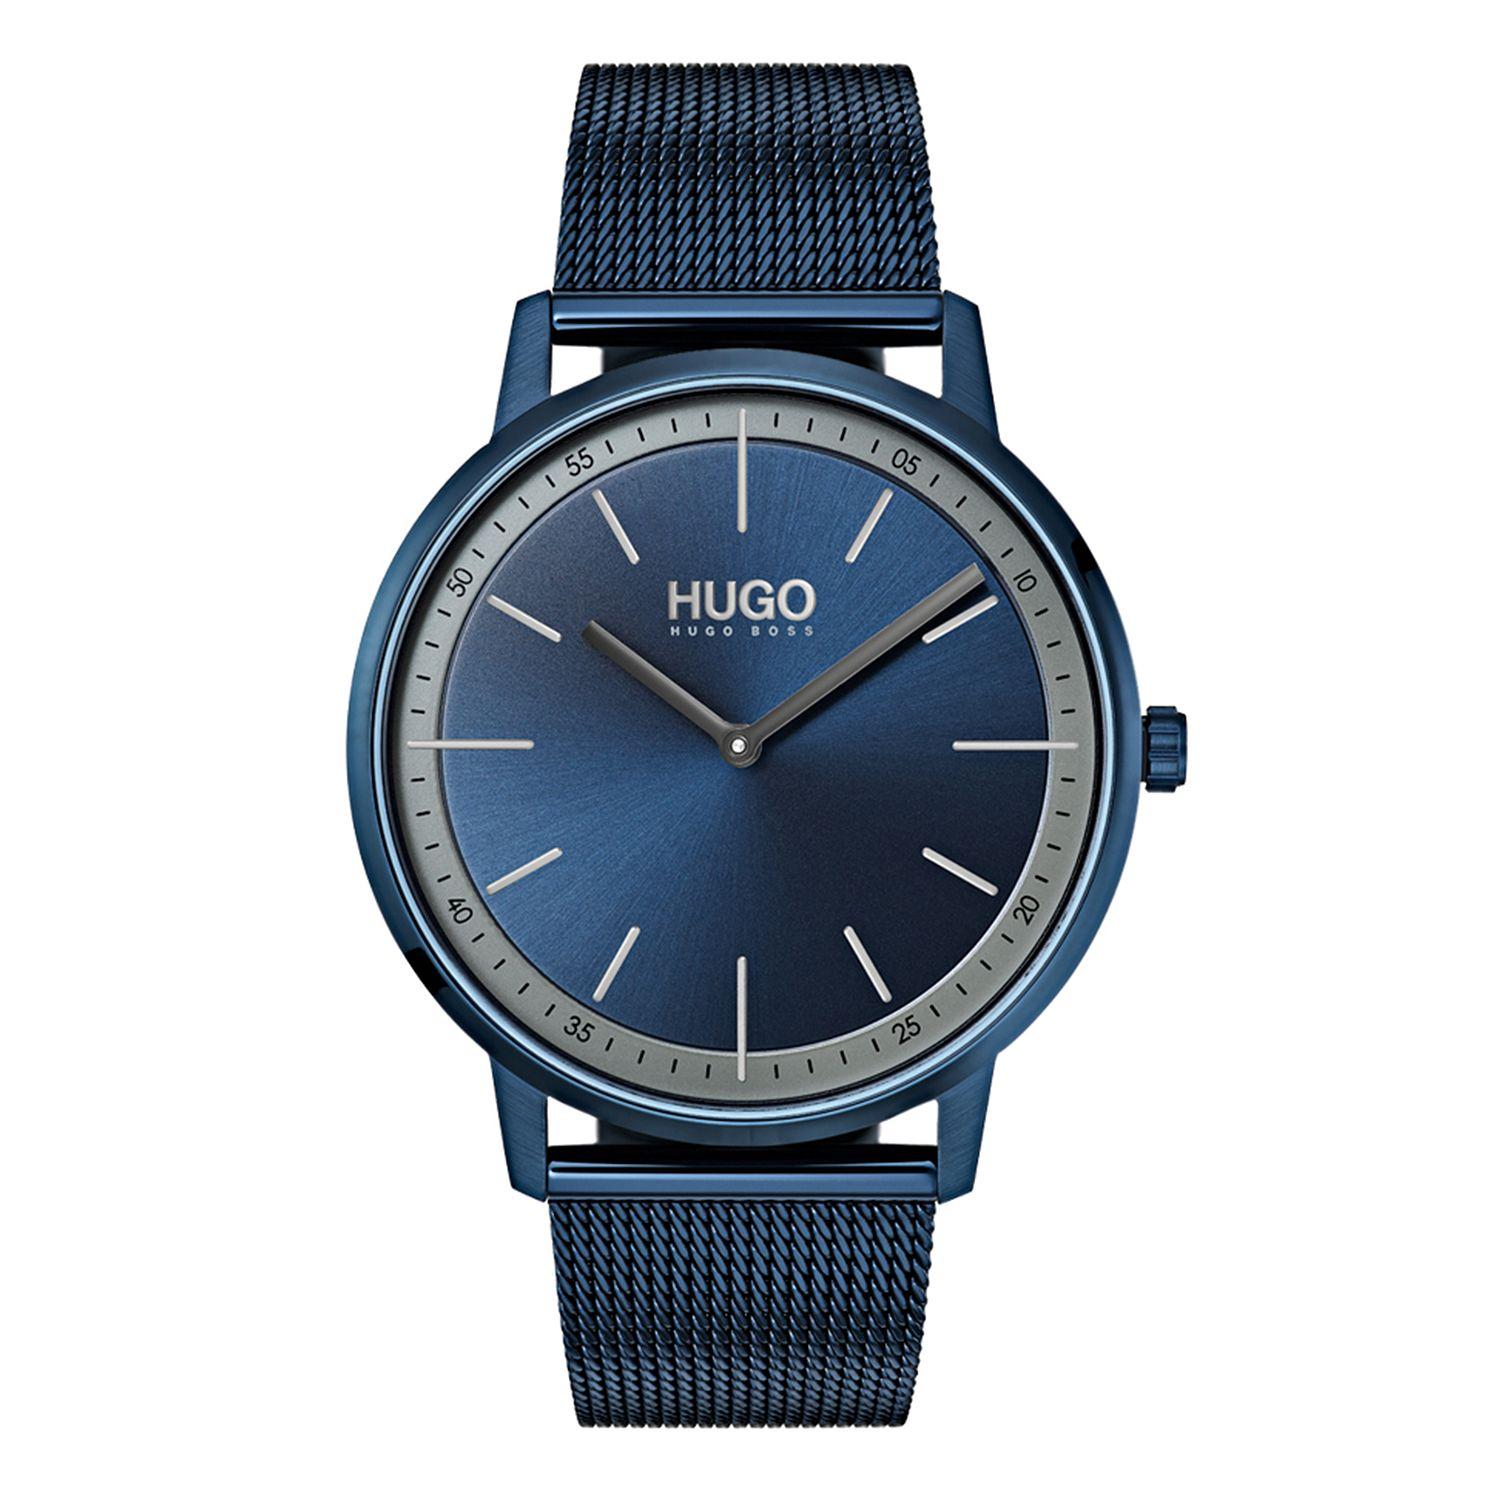 HUGO EXIST Men's Blue IP Stainless Steel Mesh Bracelet Watch £79 @ H Samuel